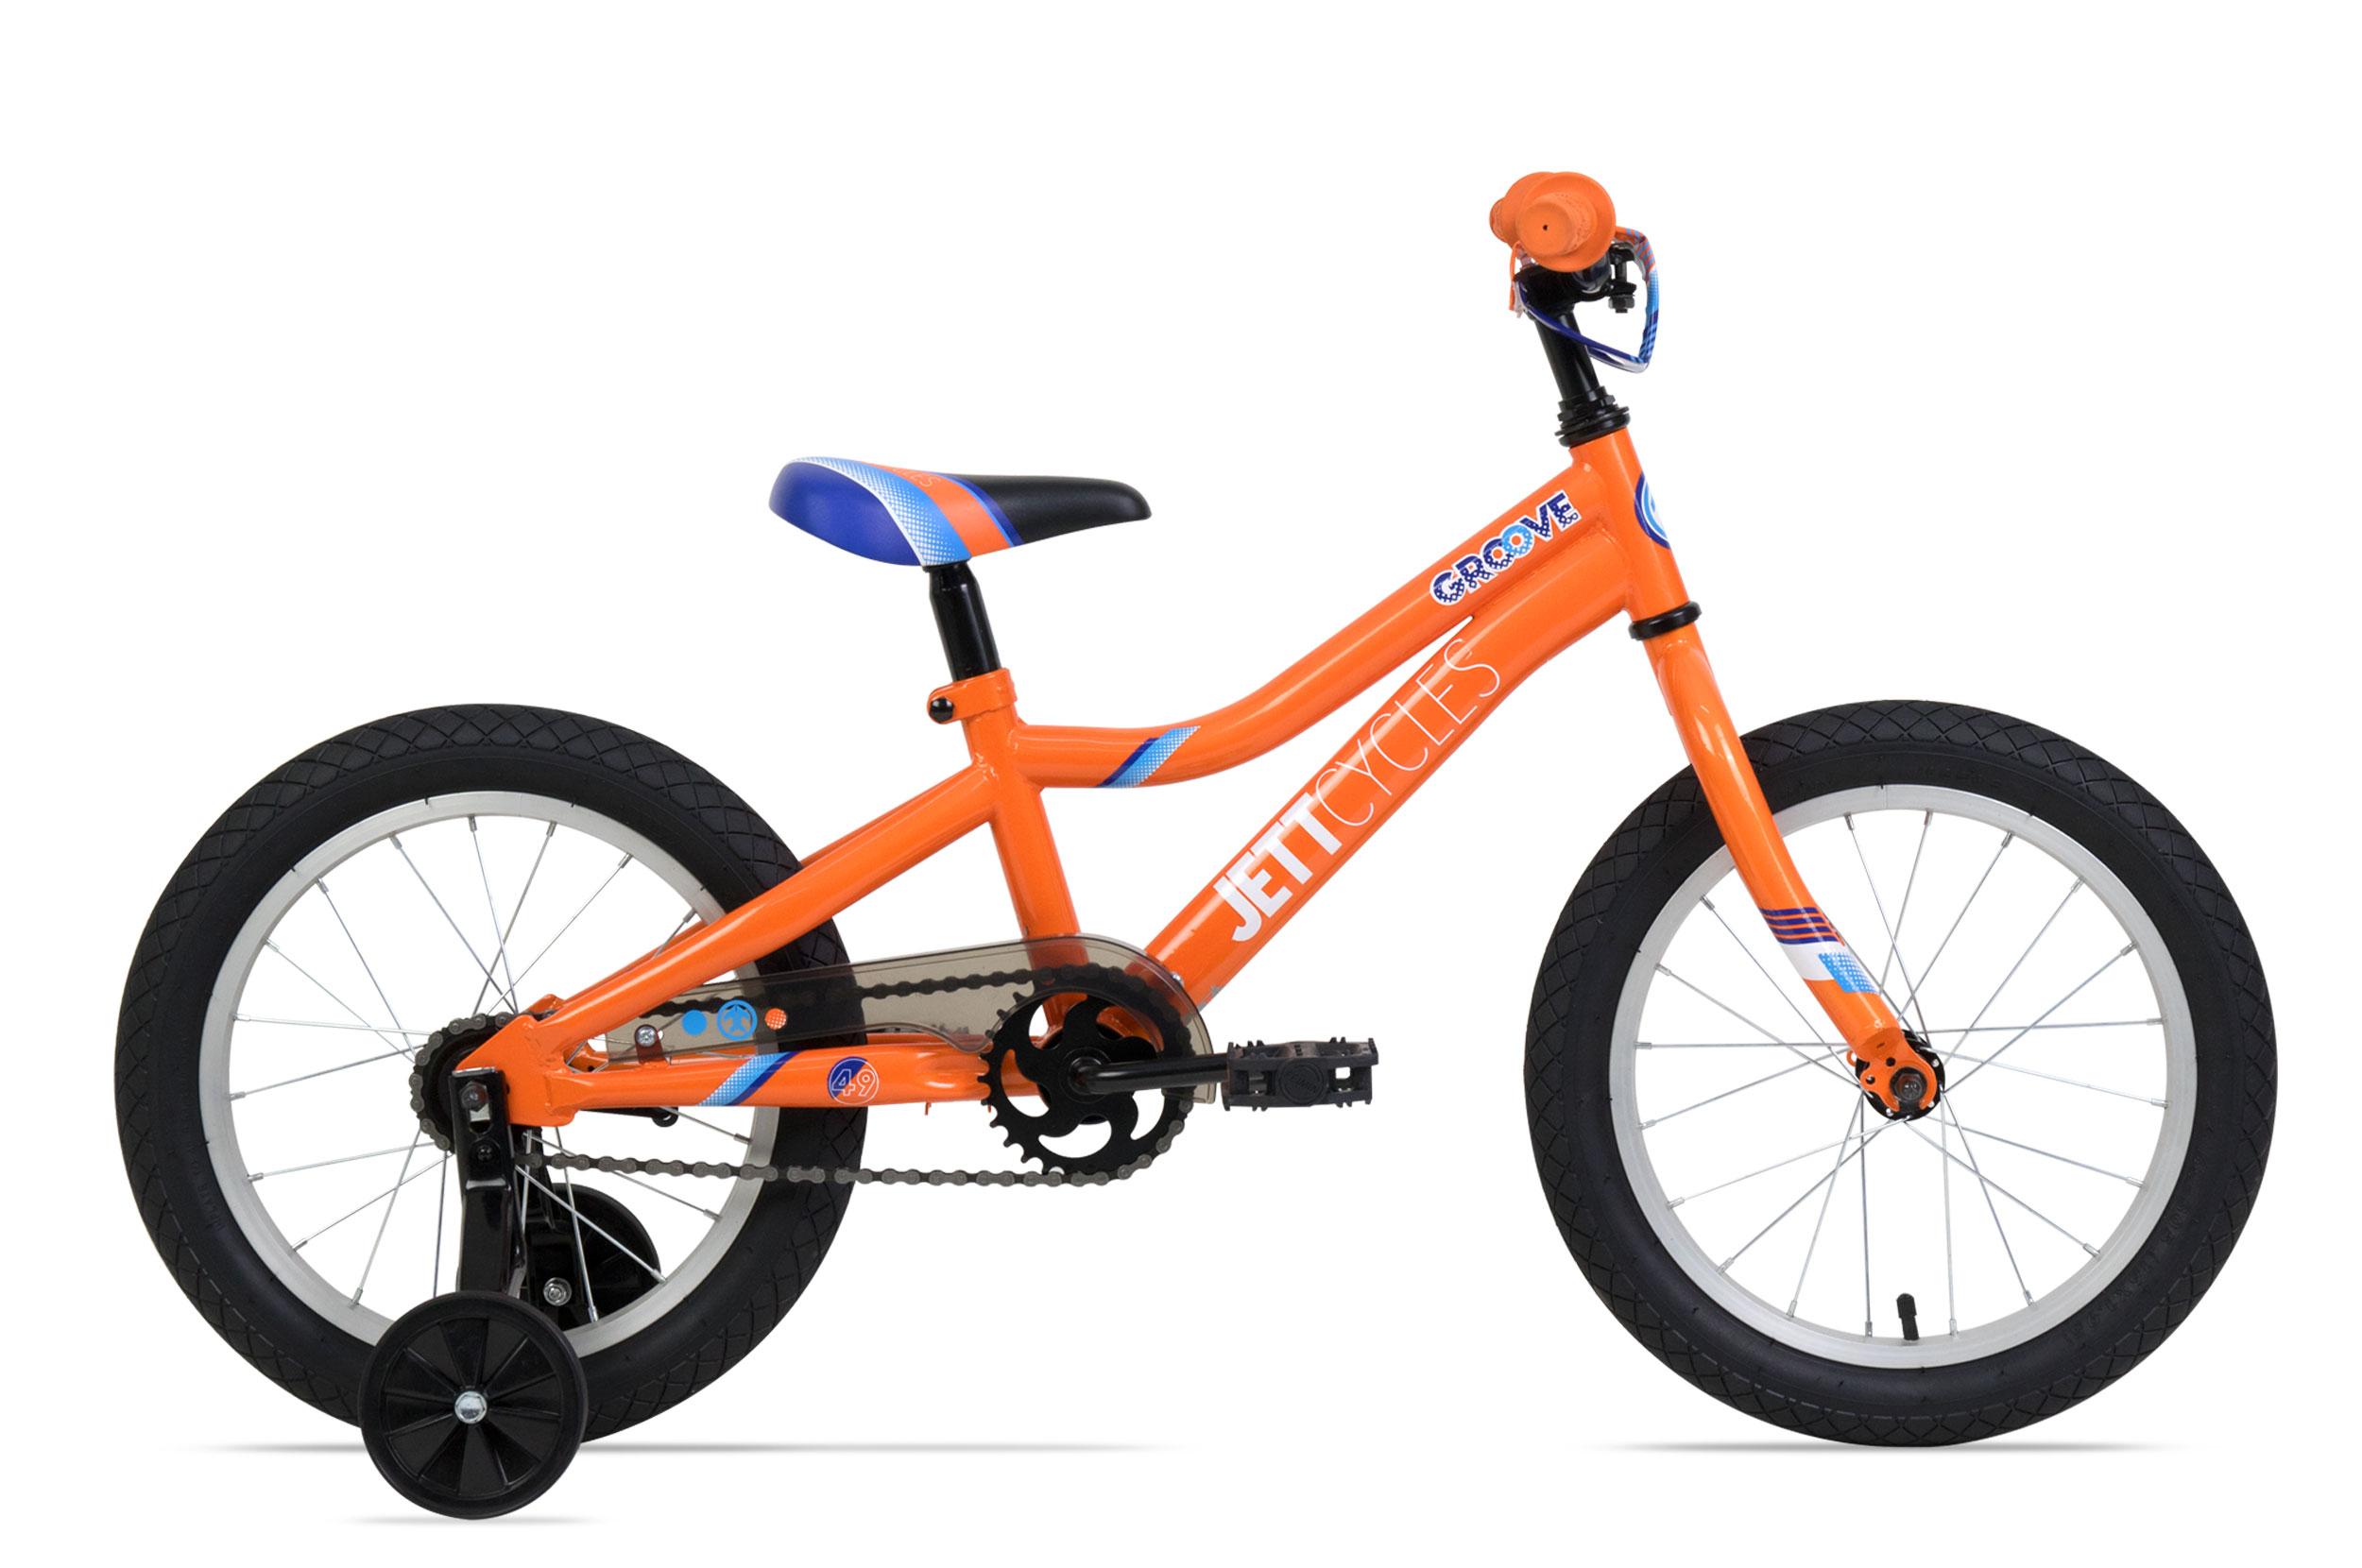 Xe đạp trẻ em Jett Cycles Groove 1.6 161418 - 947948 , 2837153822795 , 62_2100399 , 2350000 , Xe-dap-tre-em-Jett-Cycles-Groove-1.6-161418-62_2100399 , tiki.vn , Xe đạp trẻ em Jett Cycles Groove 1.6 161418